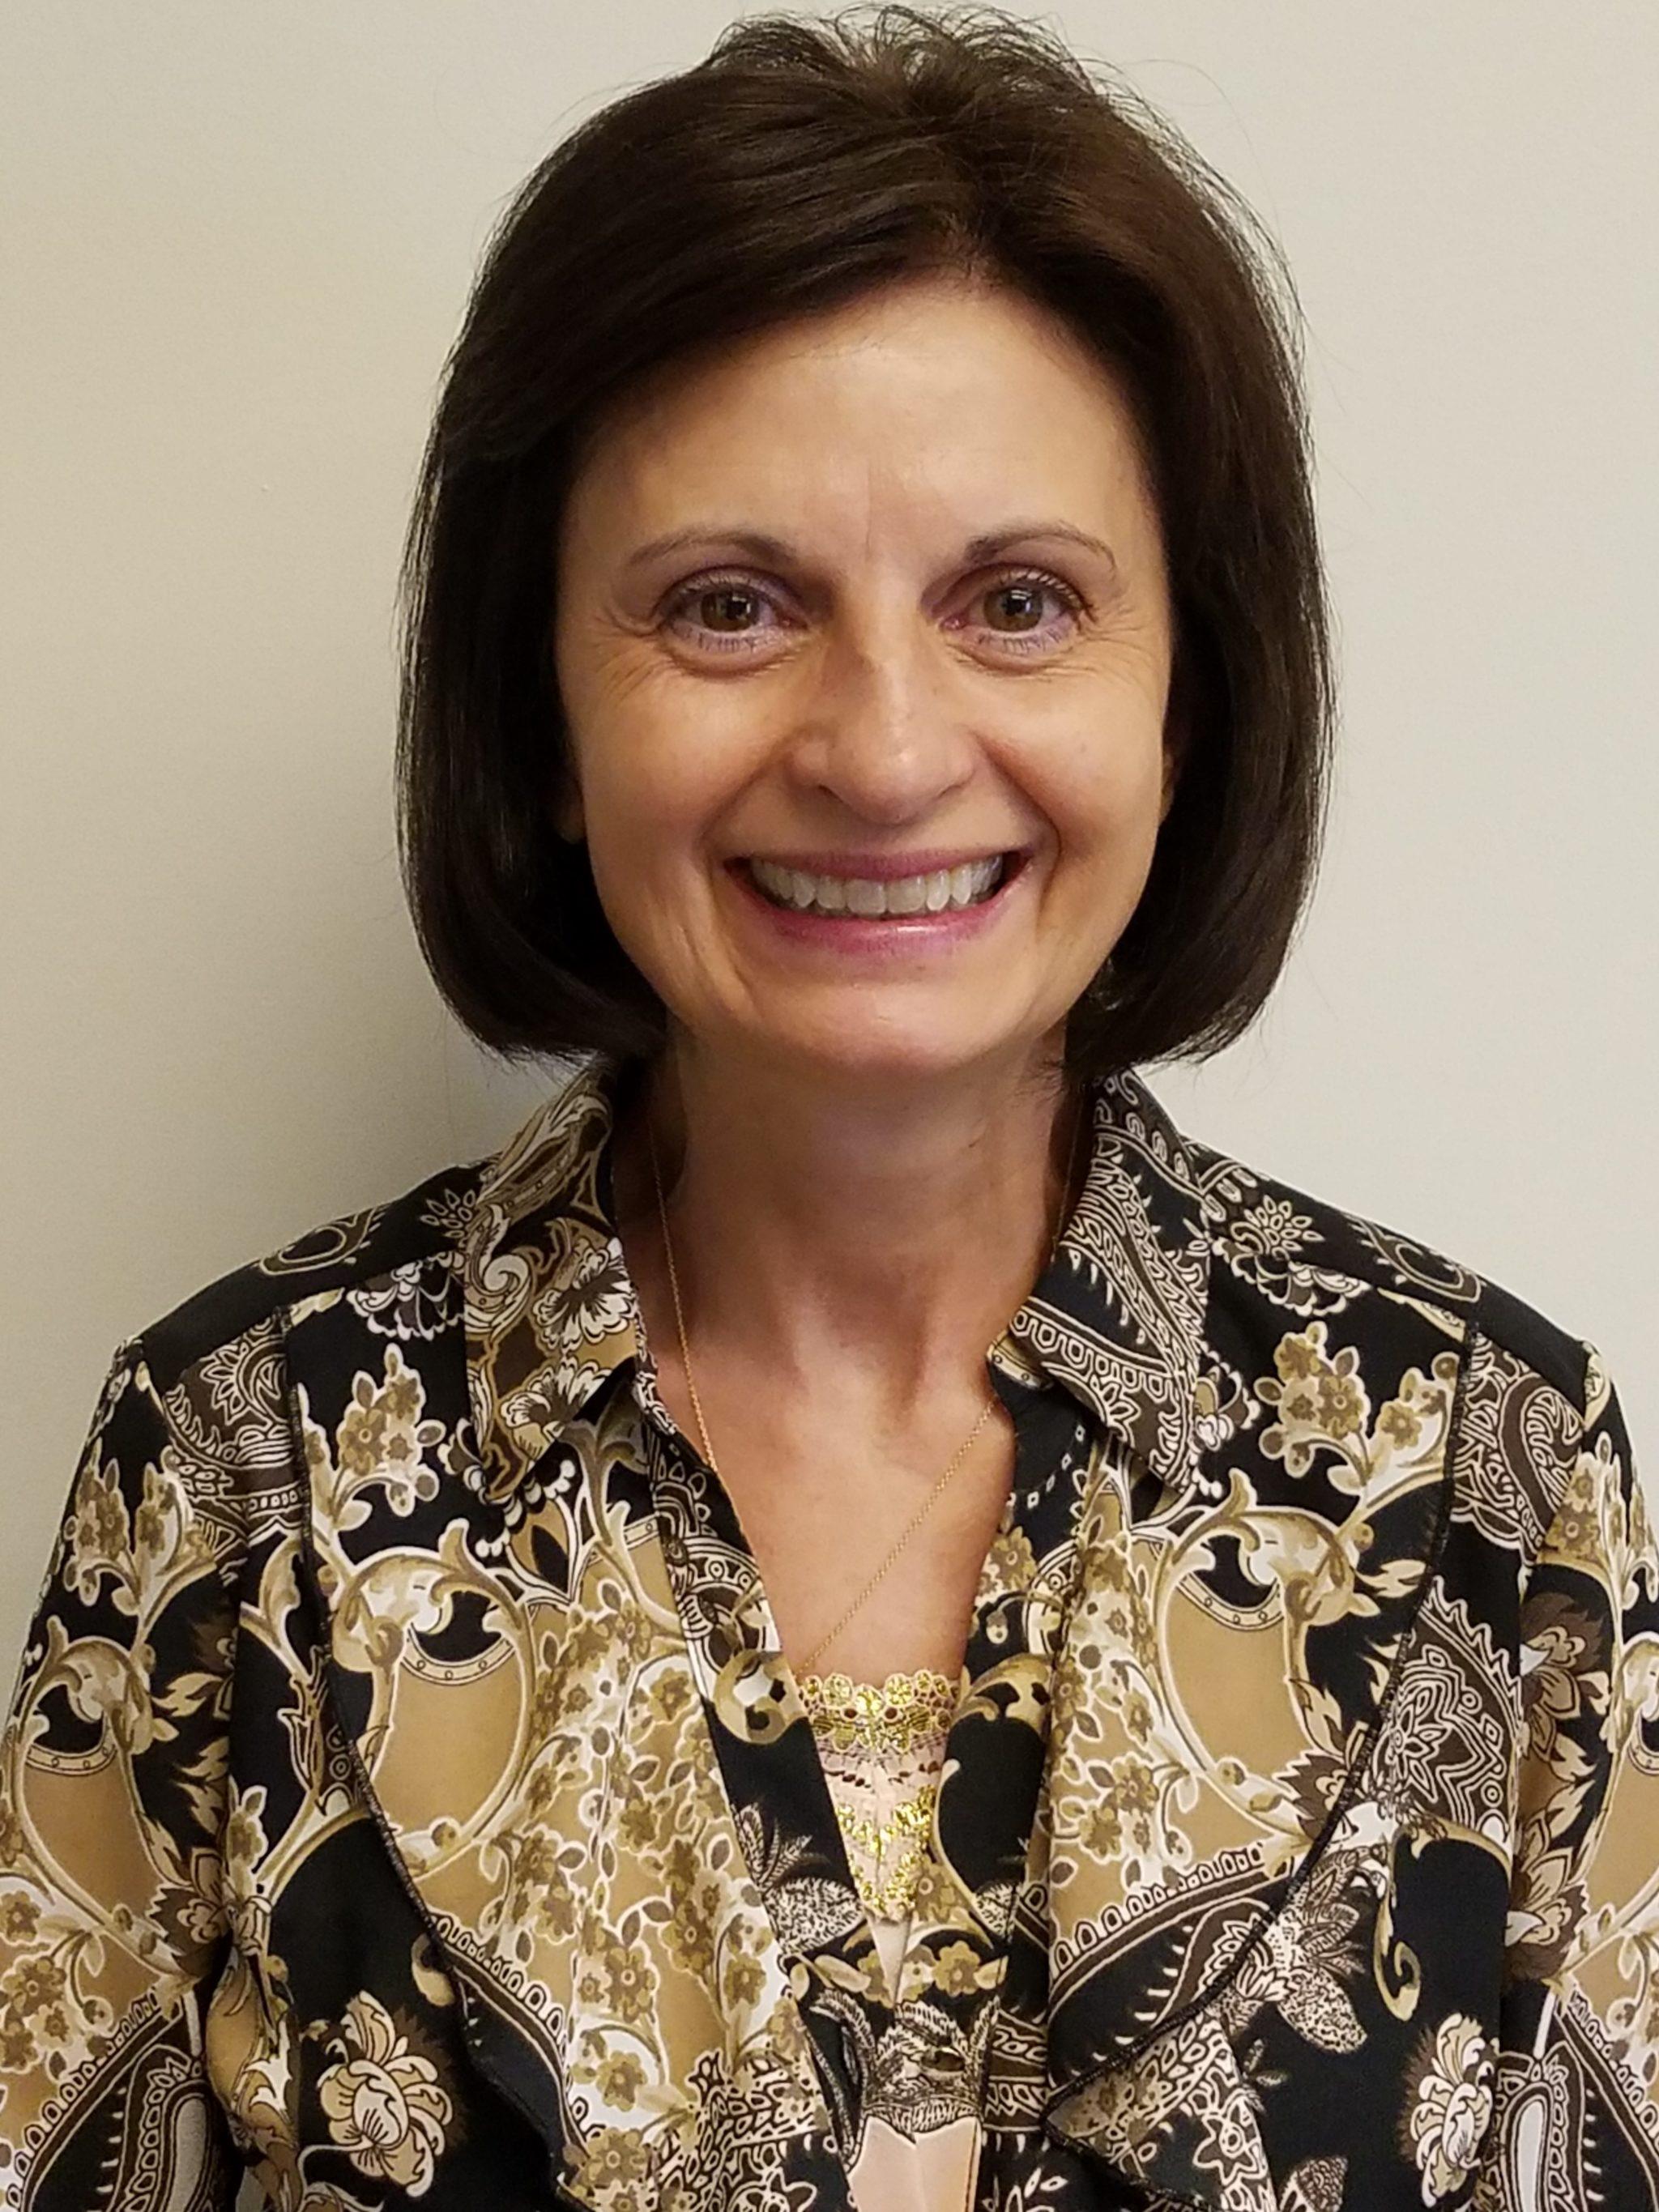 Bridget Haney - State Director of Pennsylvania